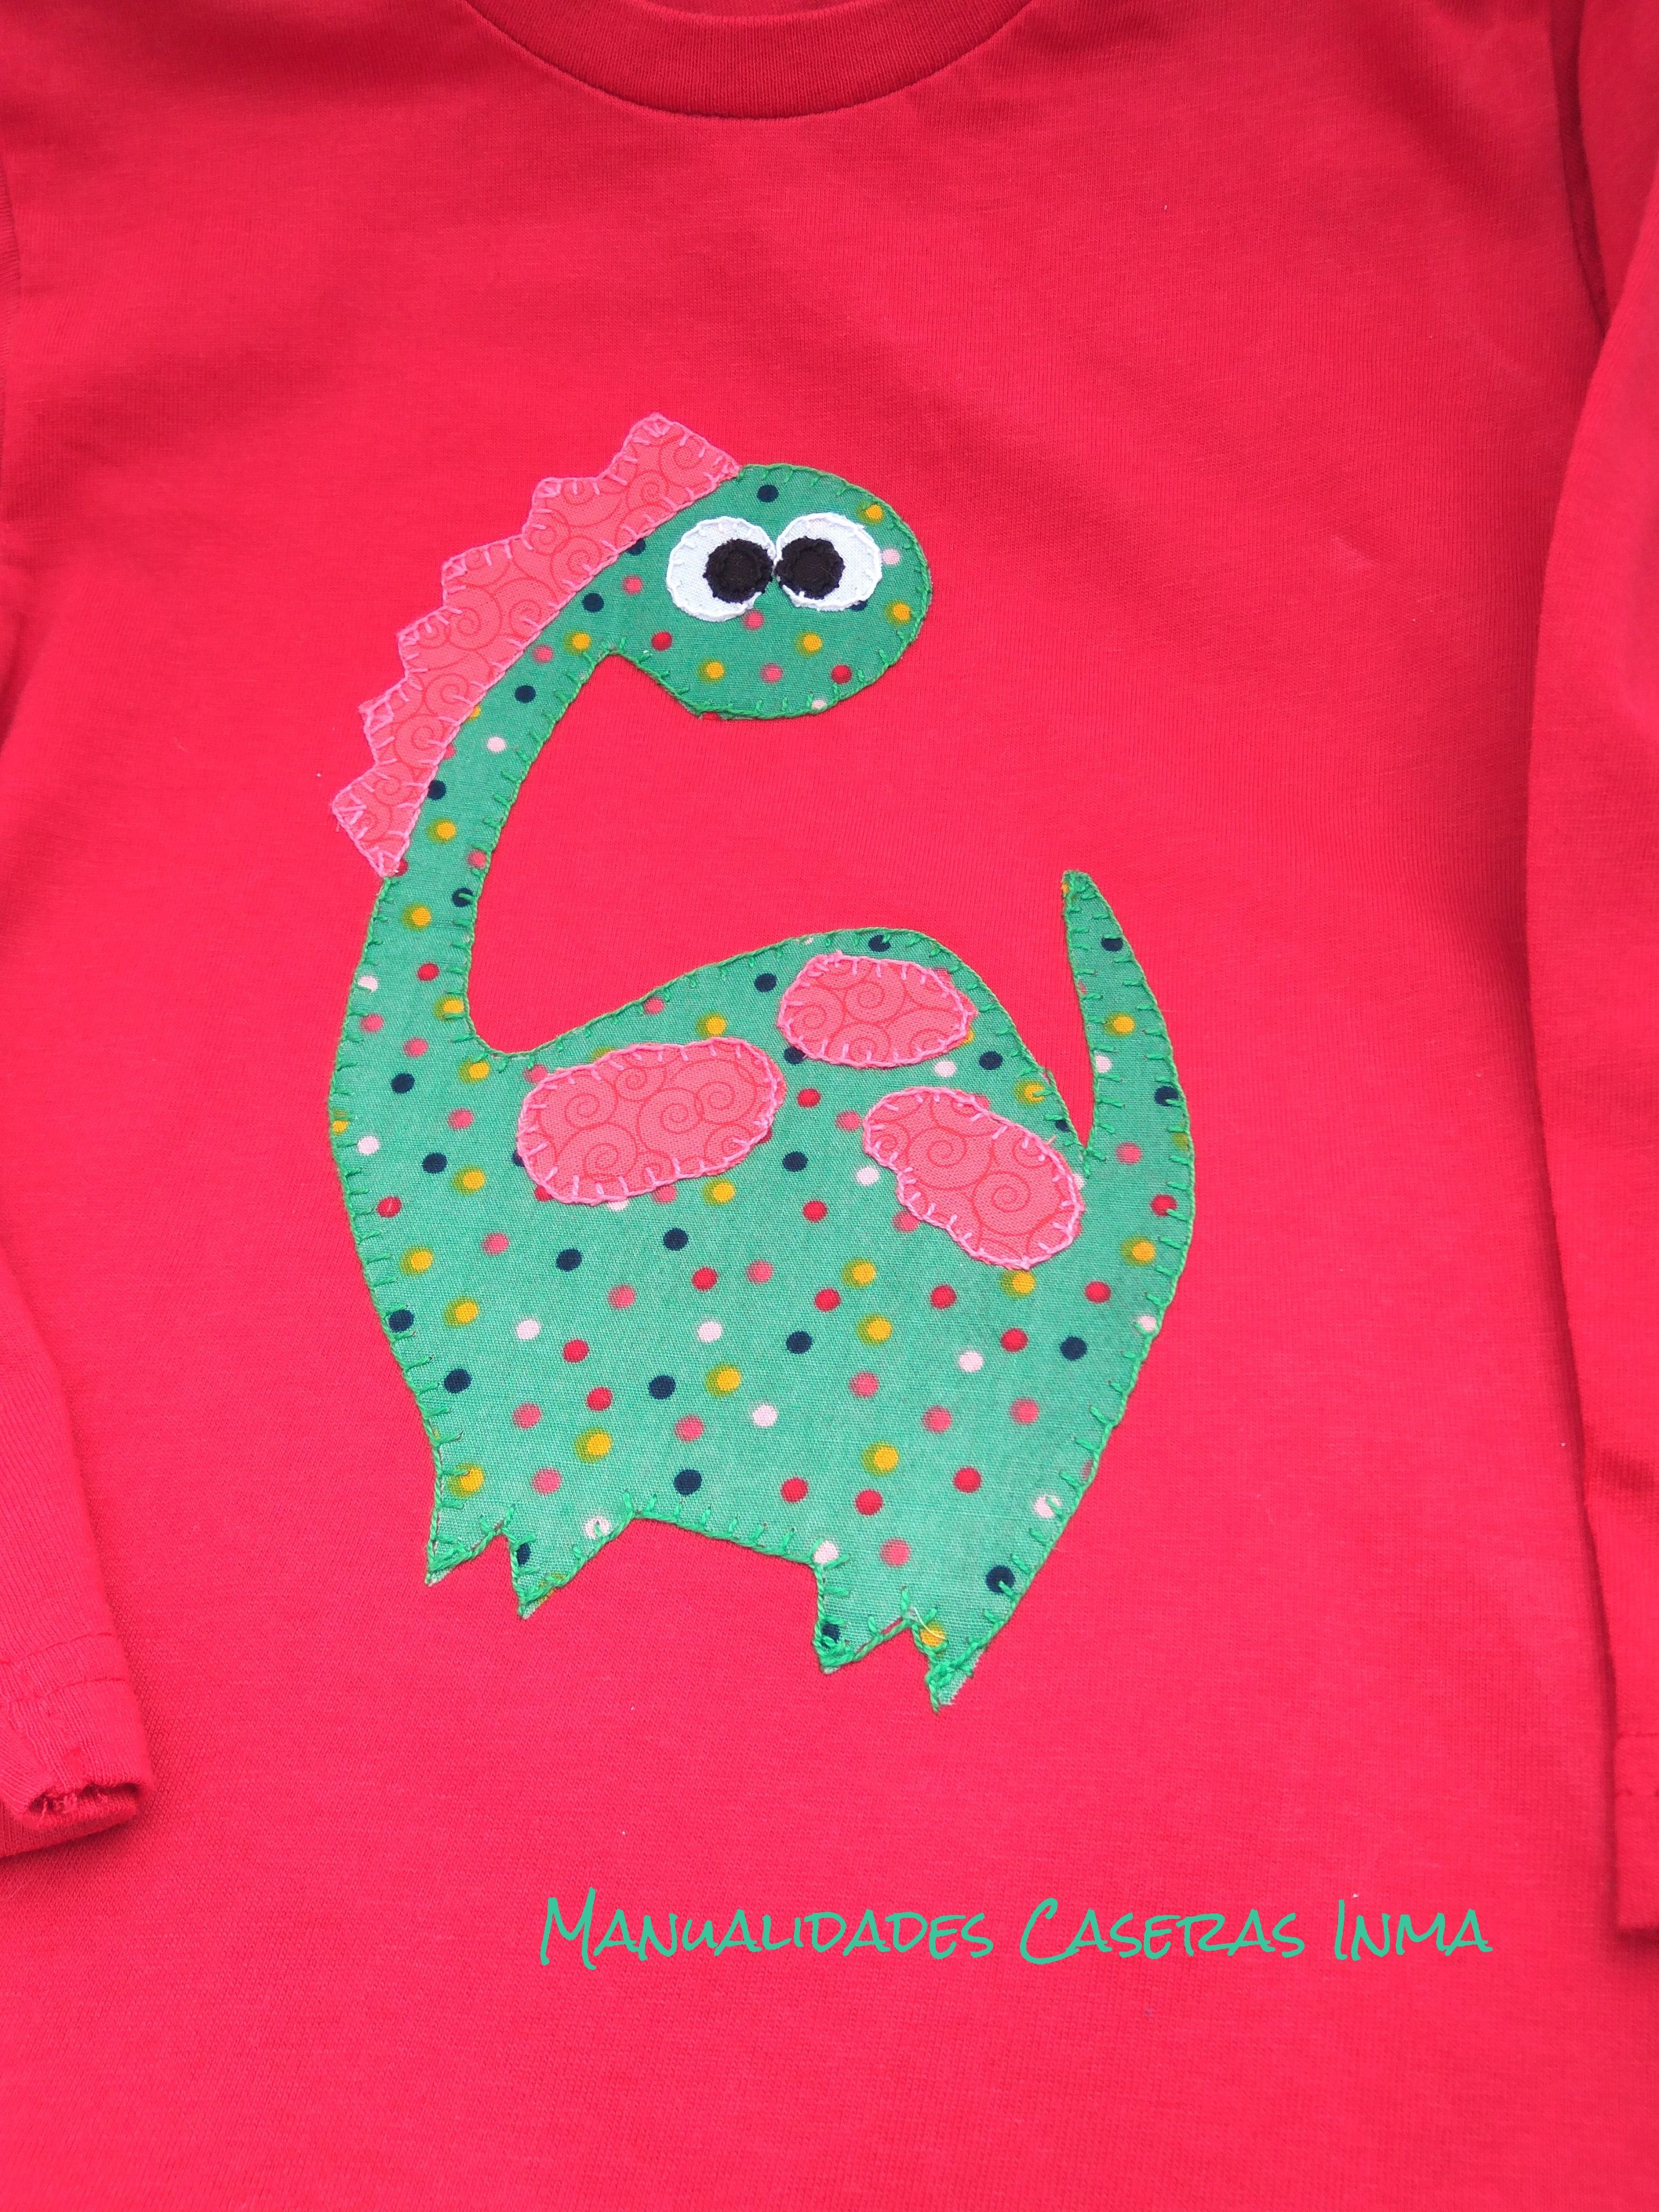 Manualidades Caseras Inma _Camiseta dinosario_ Detalle